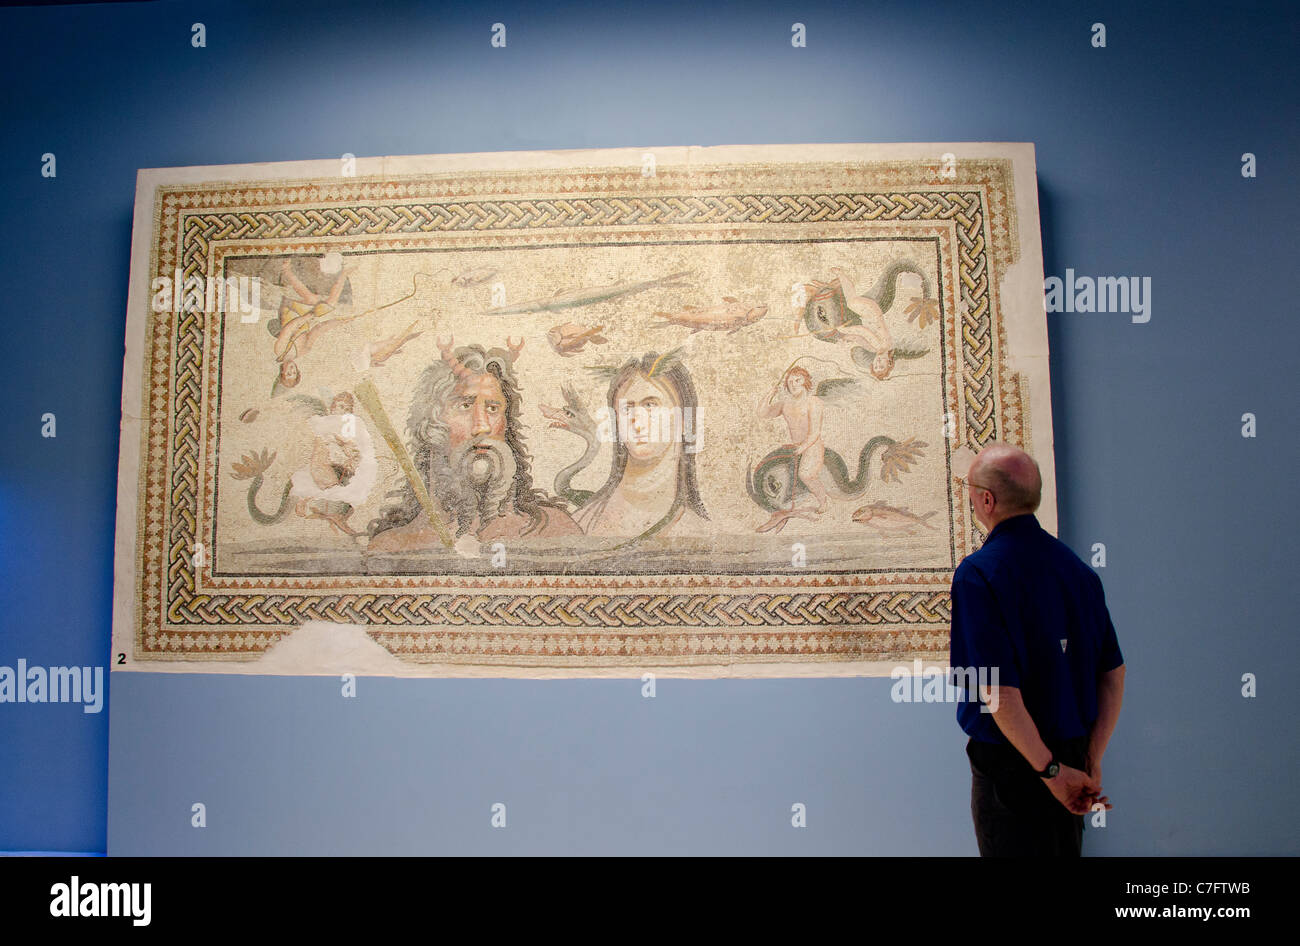 La Turchia, Anatolia sudorientale, Gaziantep. Zeugma Museo dei mosaici. Immagini Stock